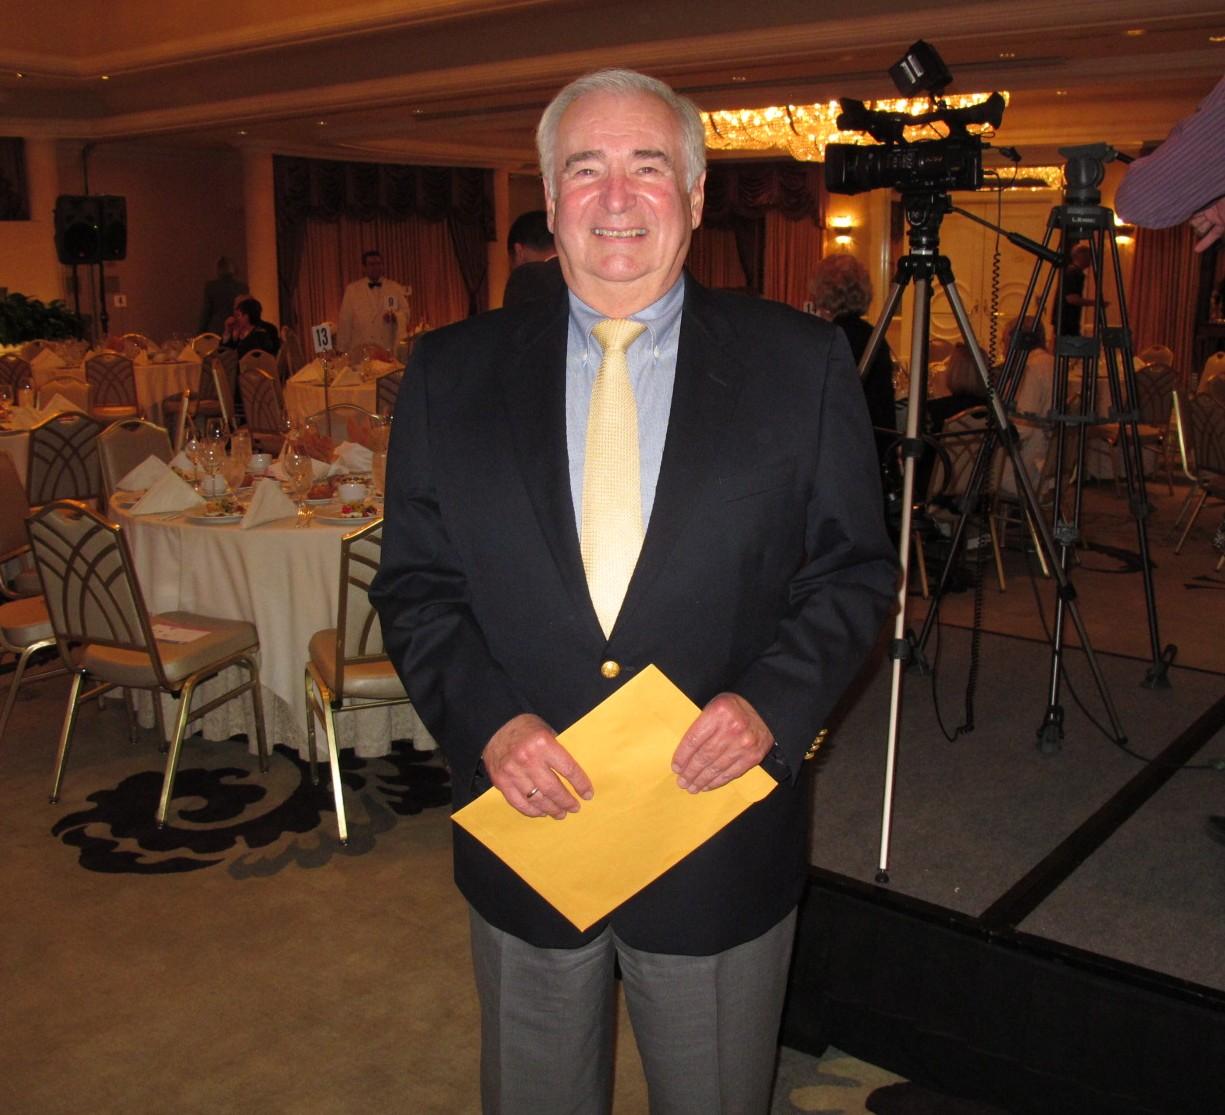 Dennis Doty, 9TH ANNUAL AMERICAN SPIRIT AWARDS Beverly Hills Hotel9TH ANNUAL AMERICAN SPIRIT AWARDS Beverly Hills Hotel